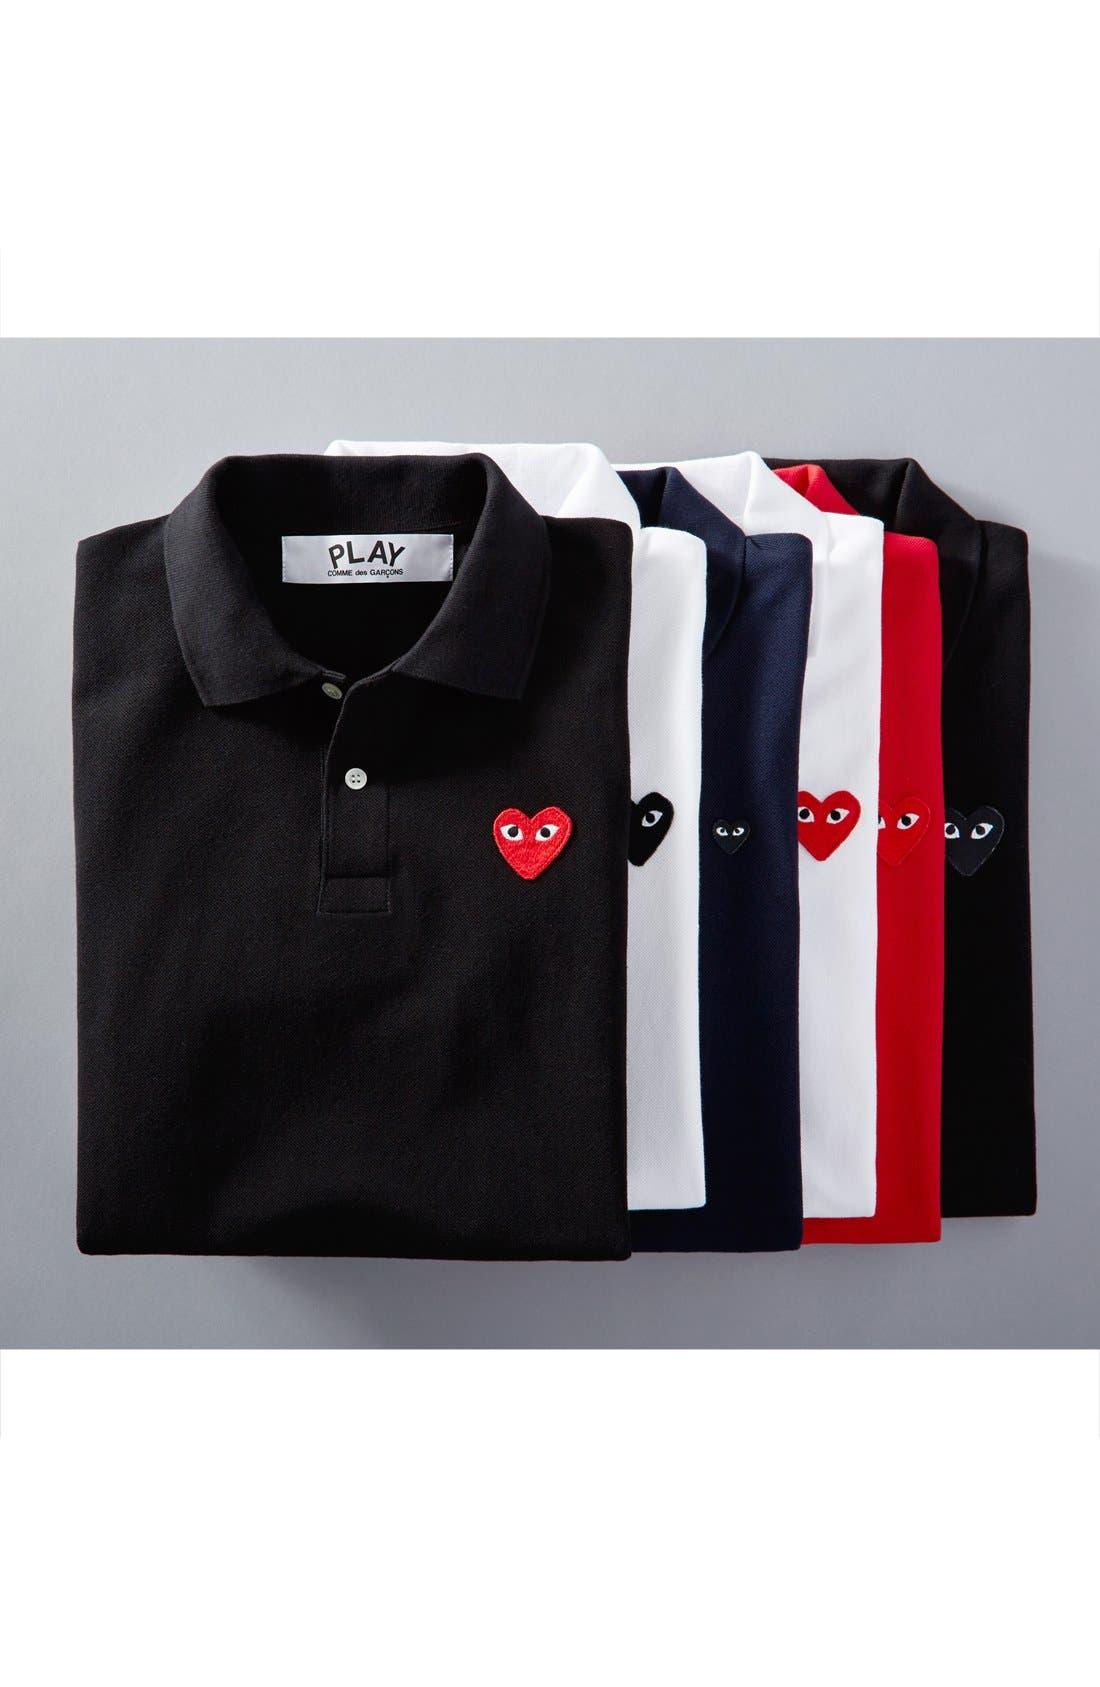 Piqué Polo with Heart Appliqué,                             Alternate thumbnail 4, color,                             BLACK